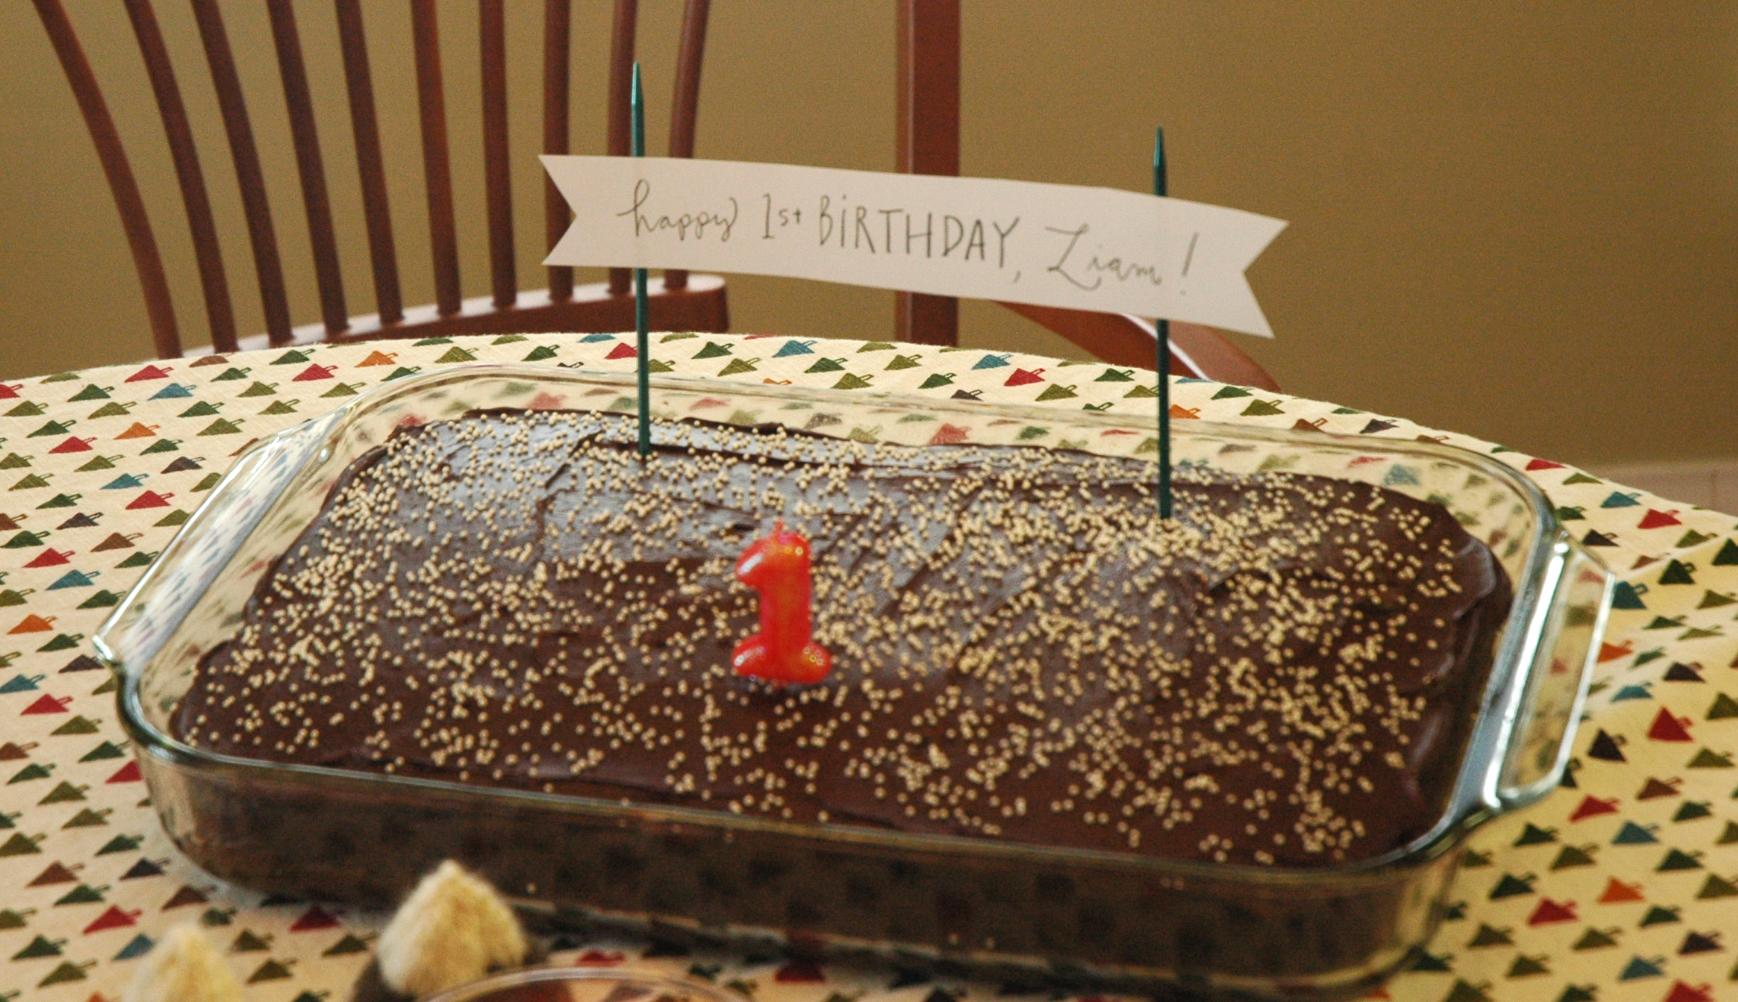 cake-1st